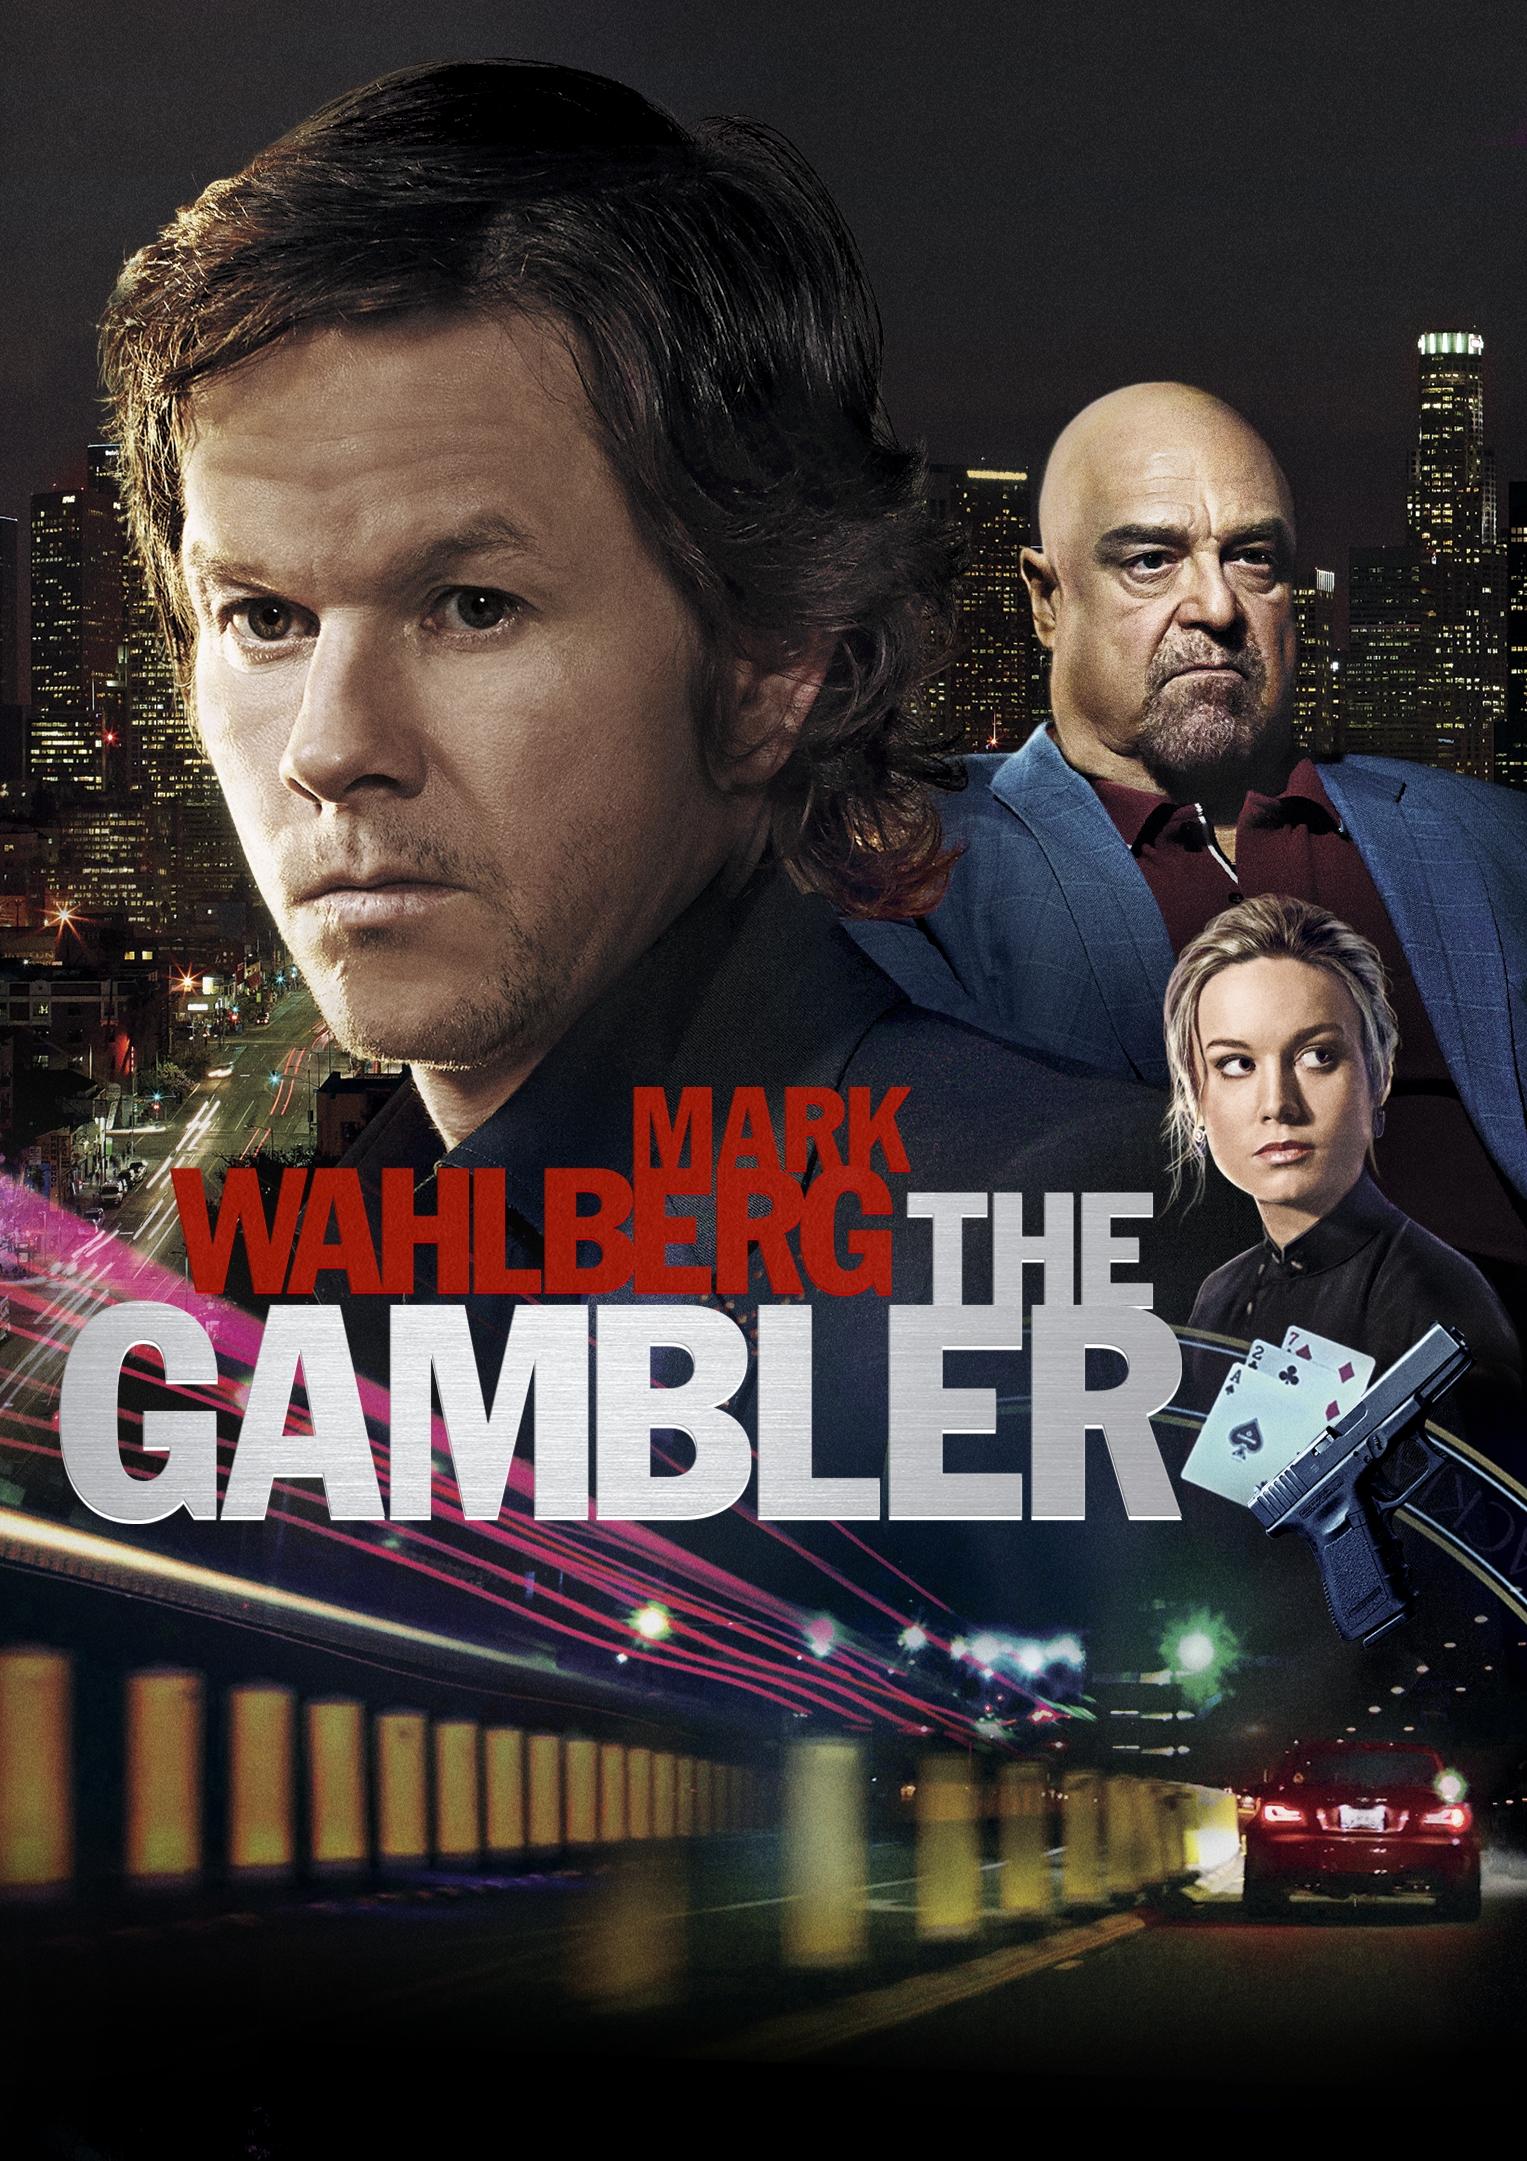 The Gambler (Remake) 2014